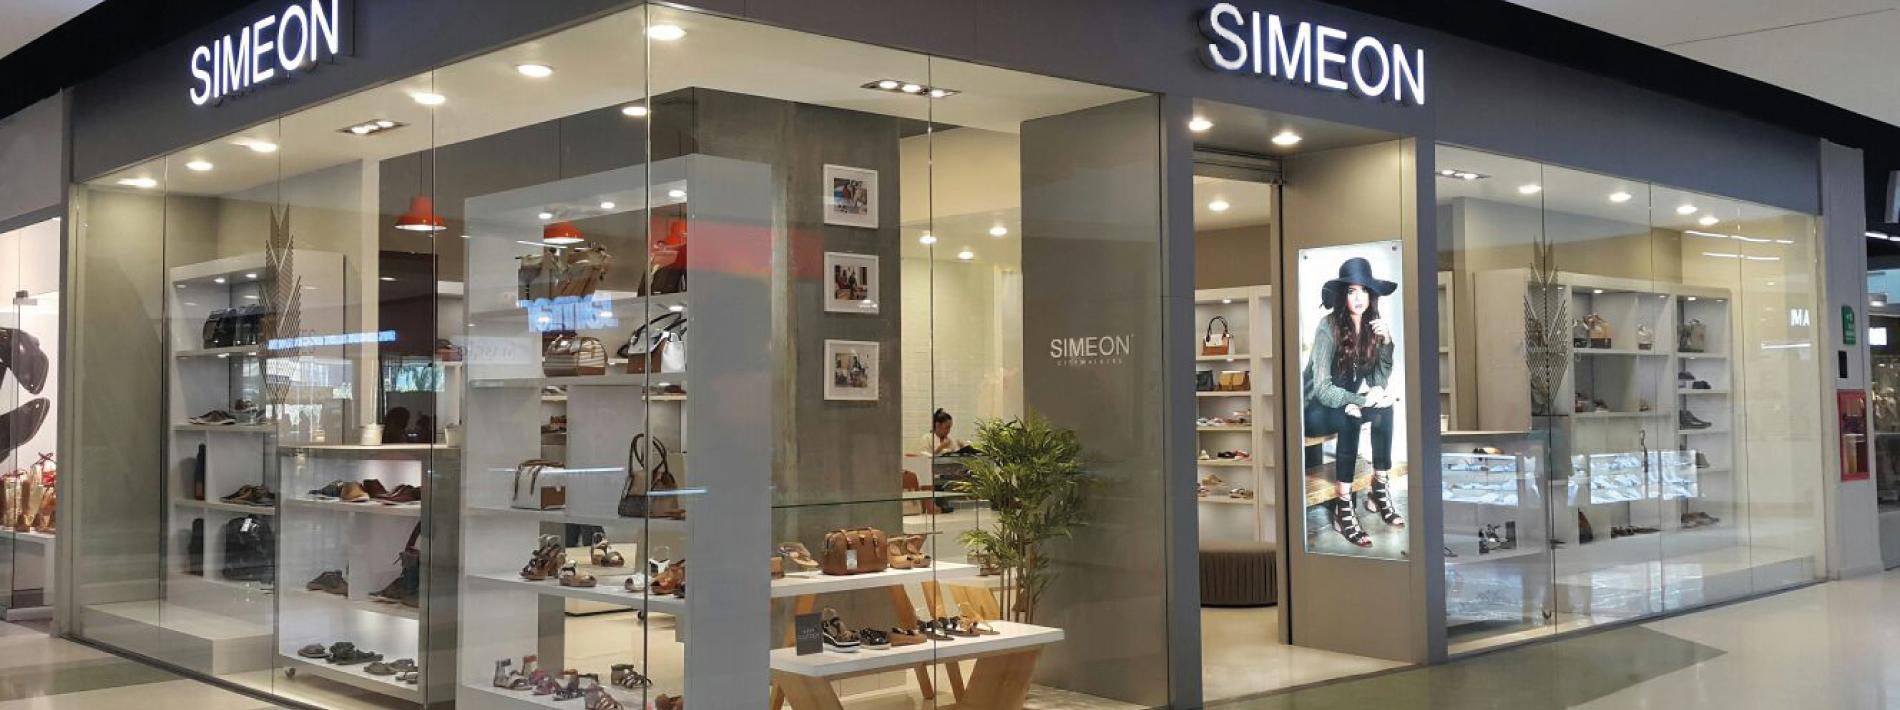 Instudio-Mayorca-Simeon